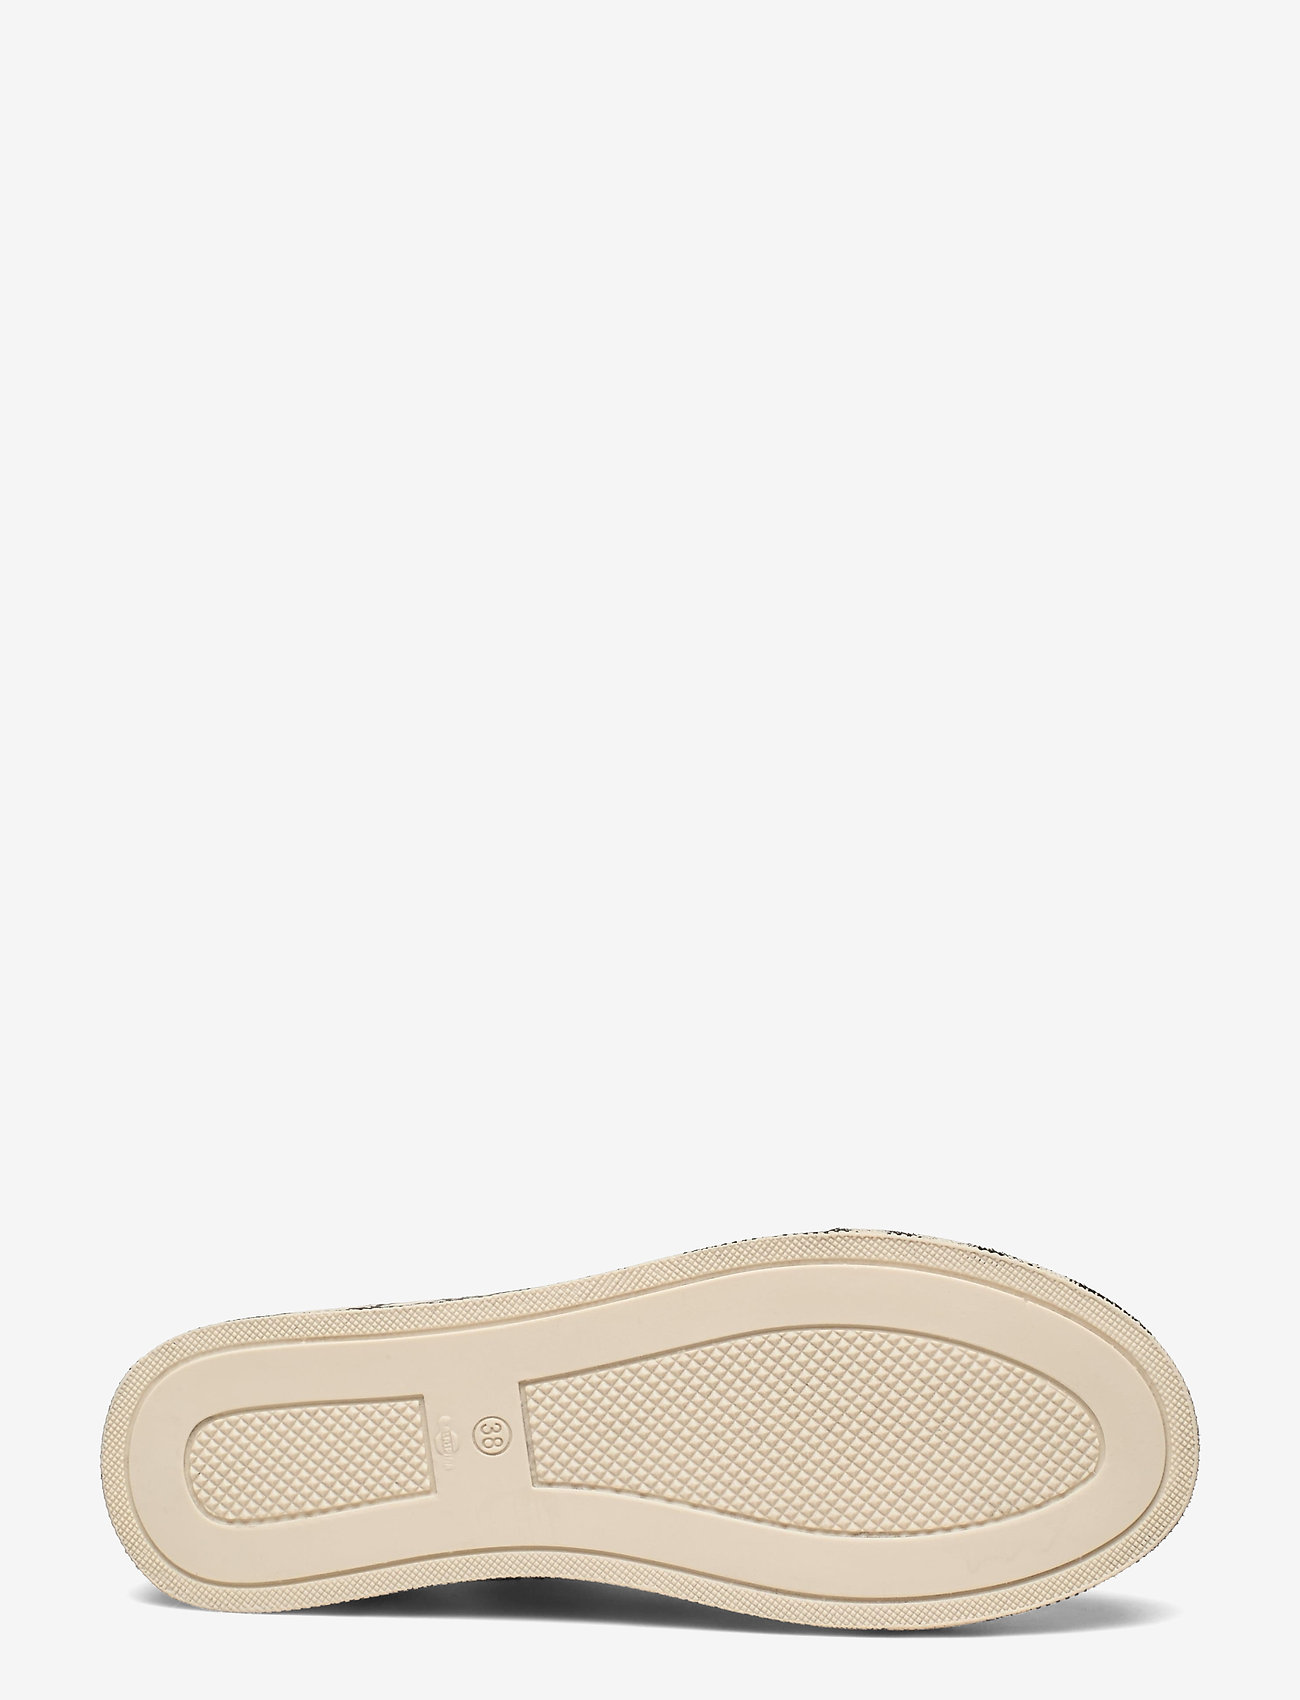 STINE GOYA - Eneko, 1192 Cotton Canvas Sneakers - lave sneakers - opium negative - 4